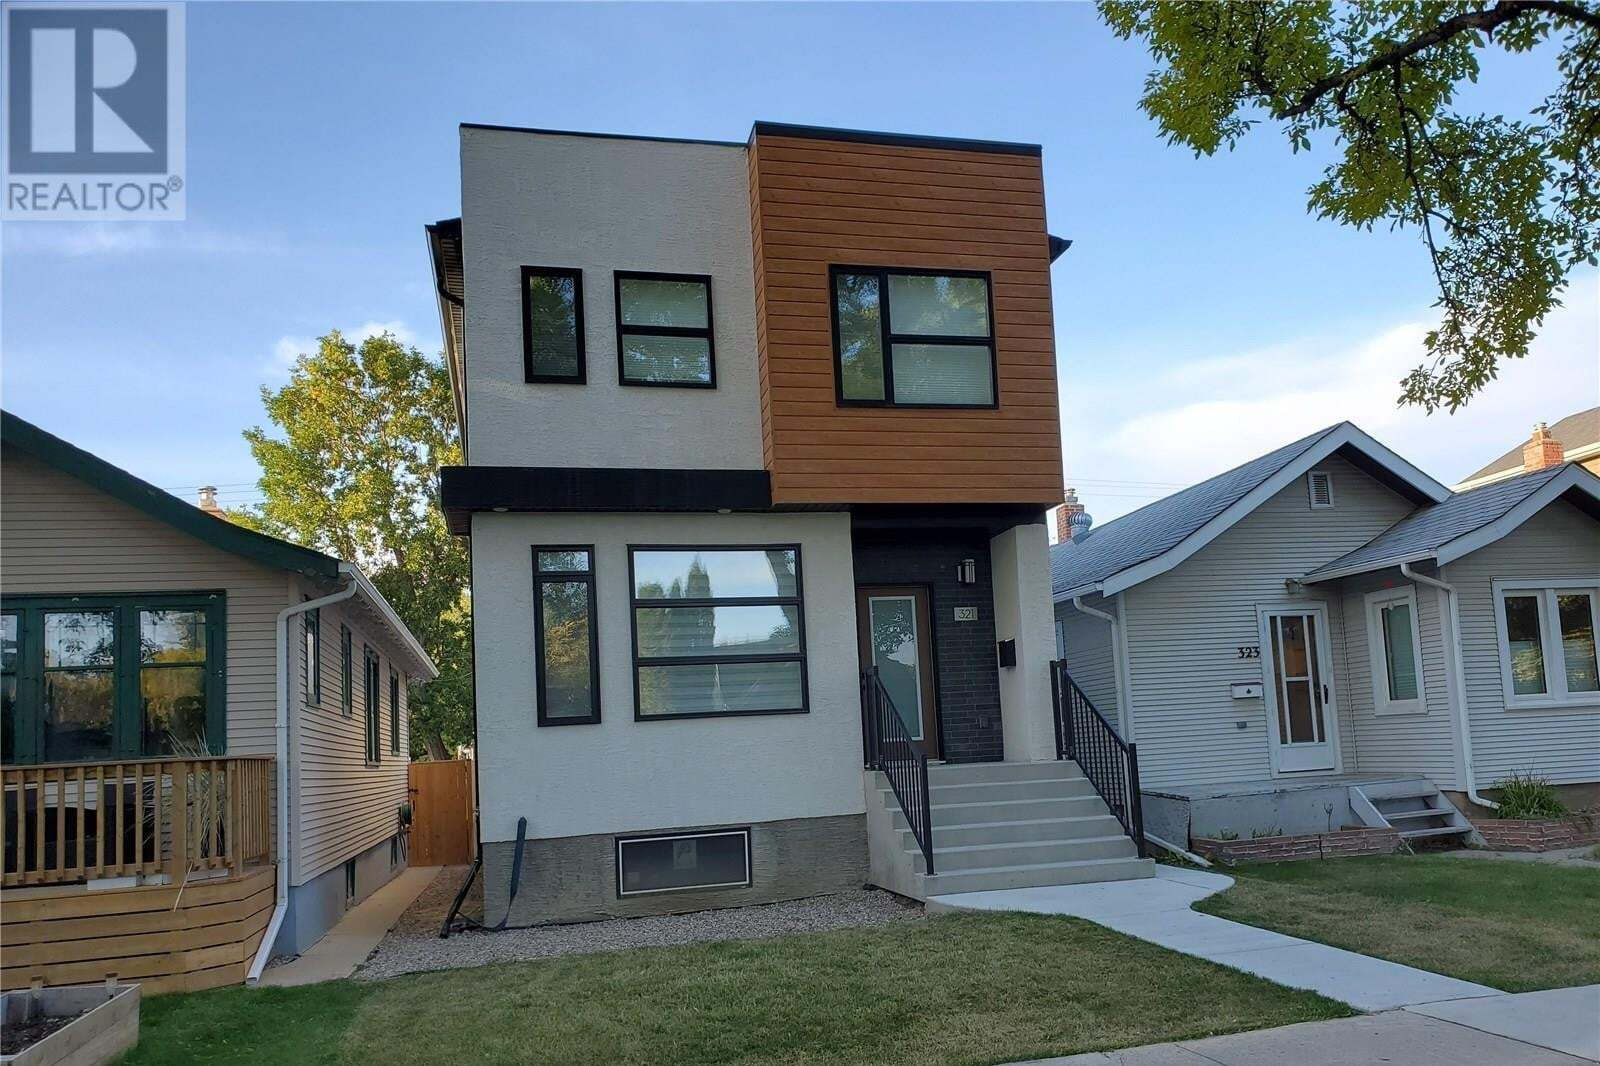 House for sale at 321 4th St E Saskatoon Saskatchewan - MLS: SK827371